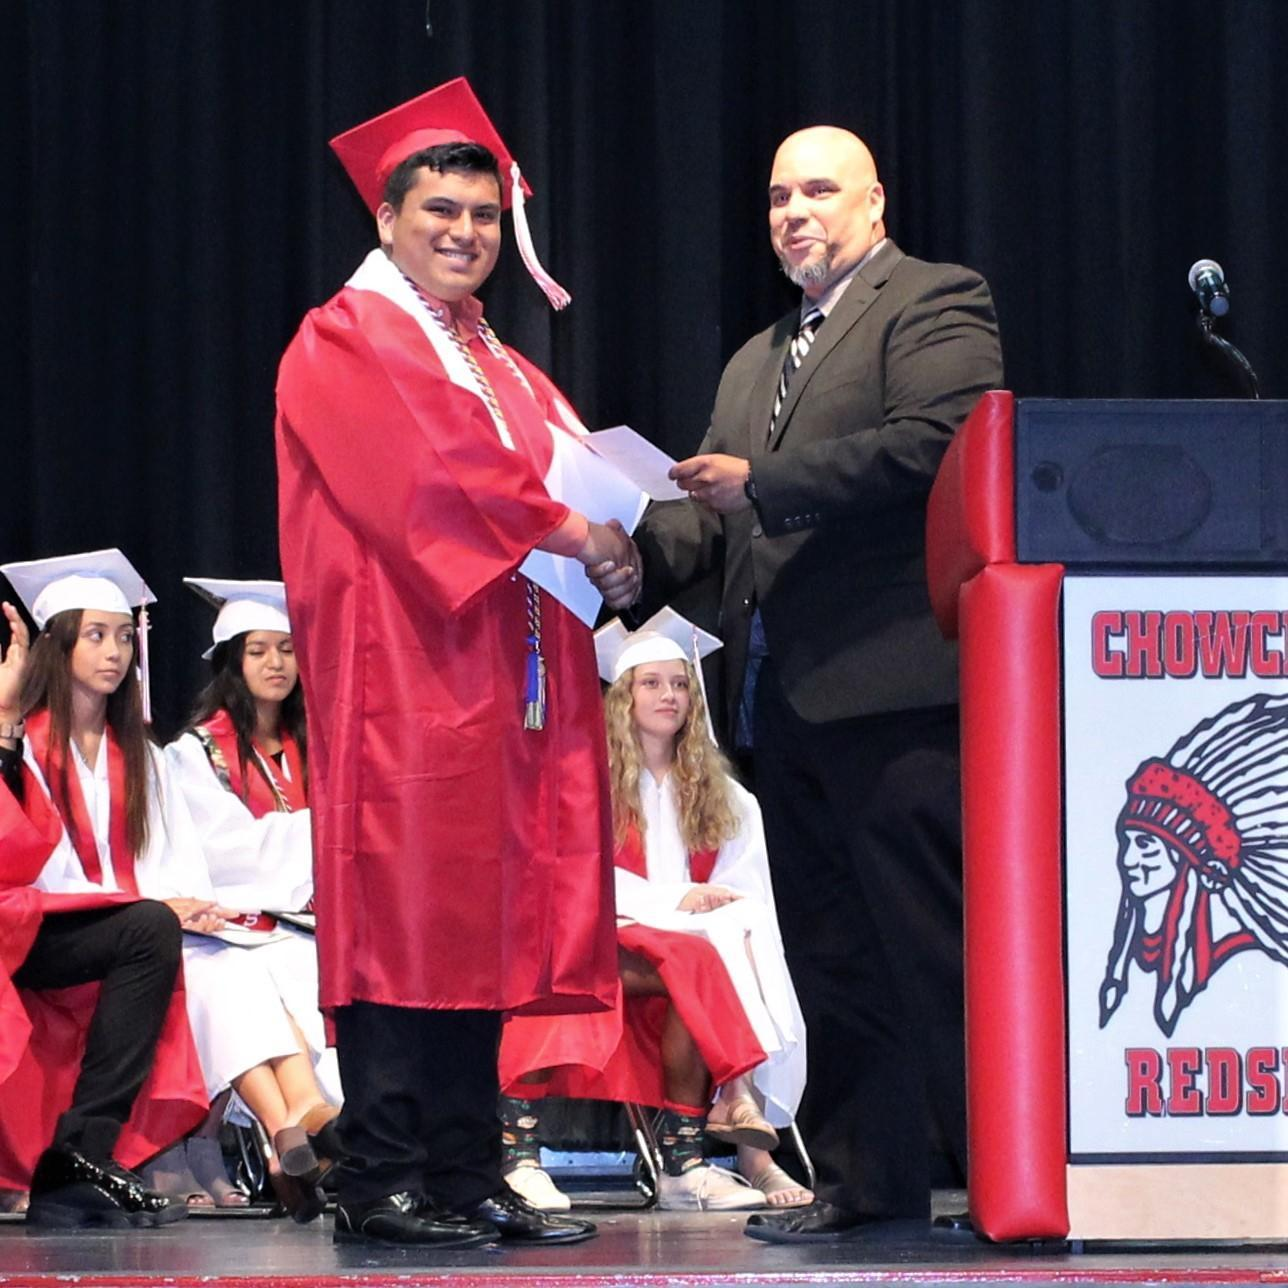 Alan Martinez, CUHS Assistant Principal Chris Rodriguez